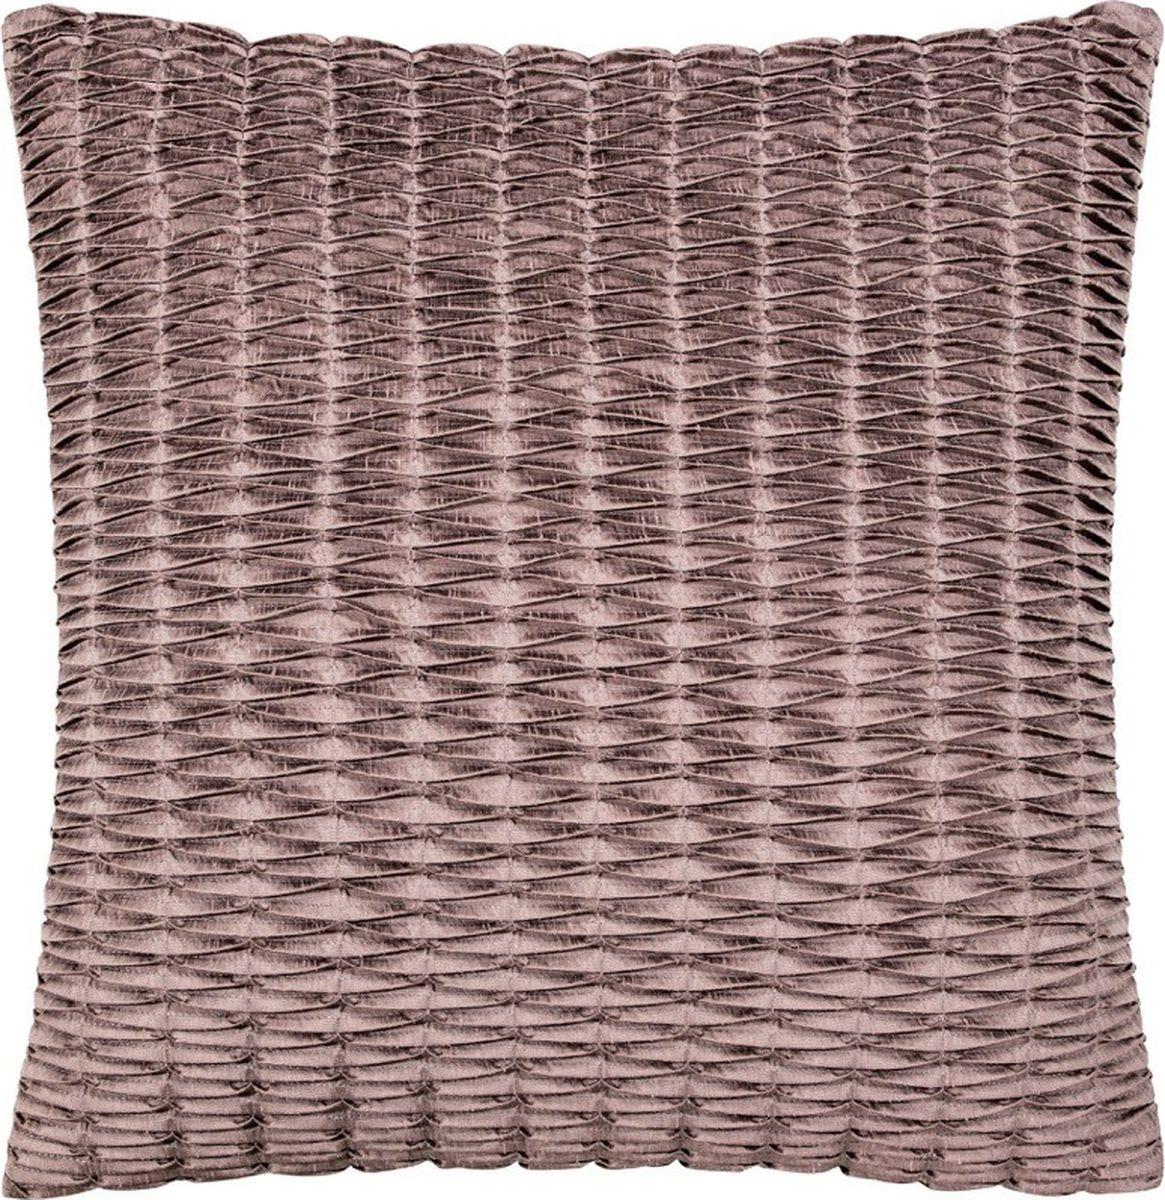 Подушка декоративная Togas Бьелла, 45 х 45 см40.16.70.0288